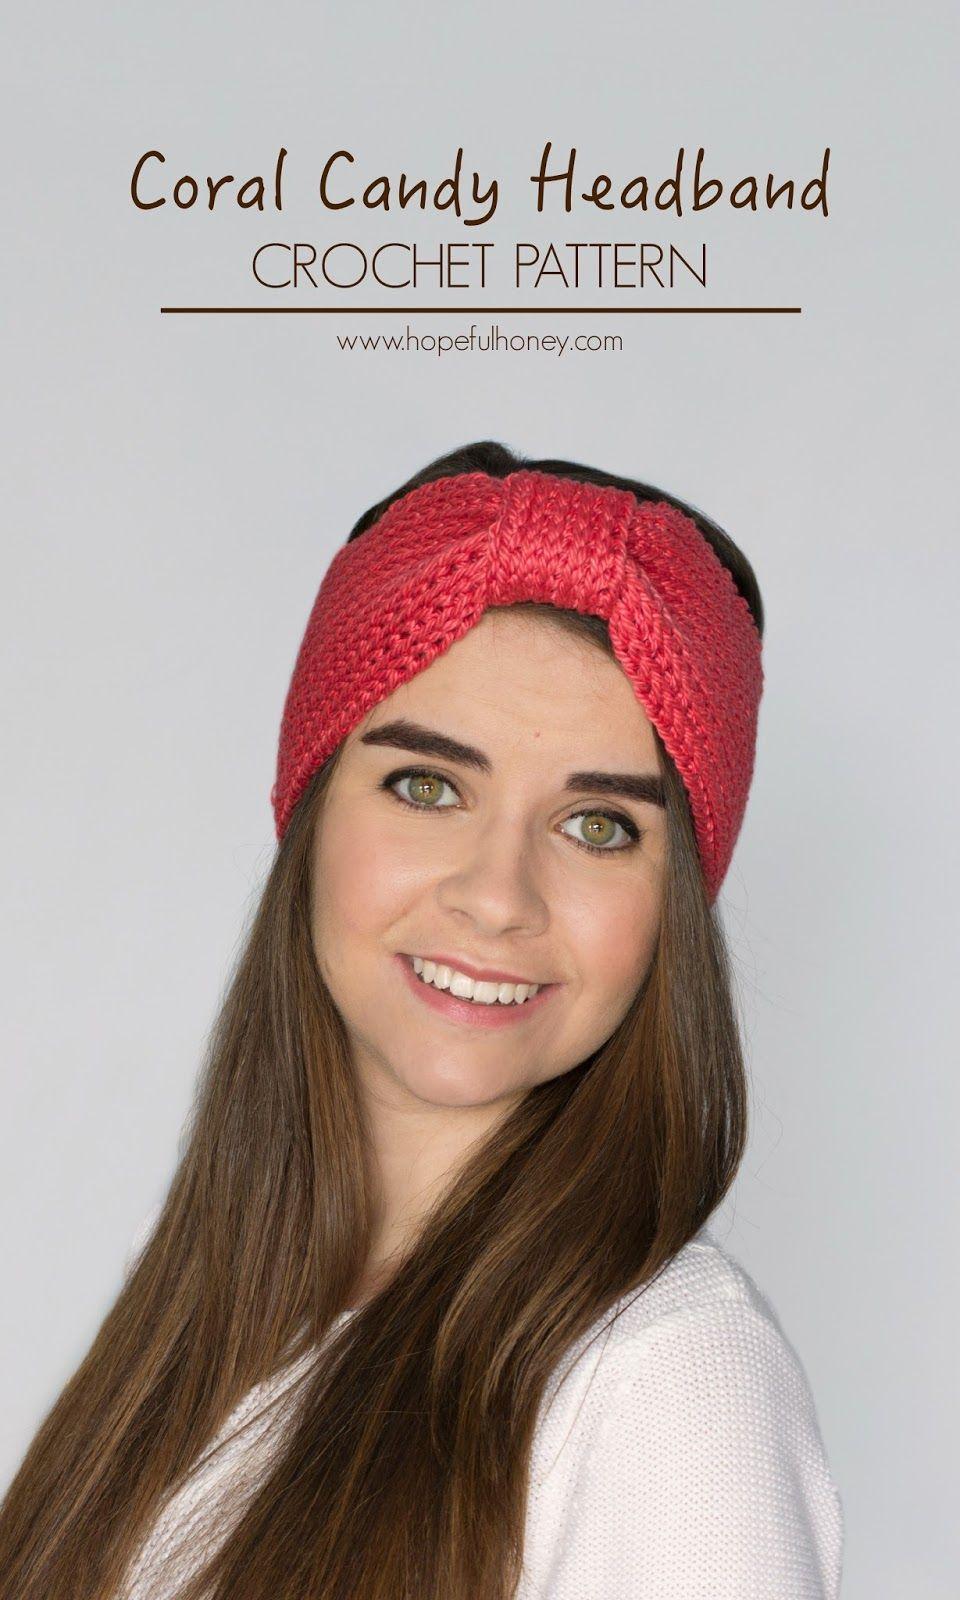 Coral Candy Headband Crochet Pattern | Pinterest